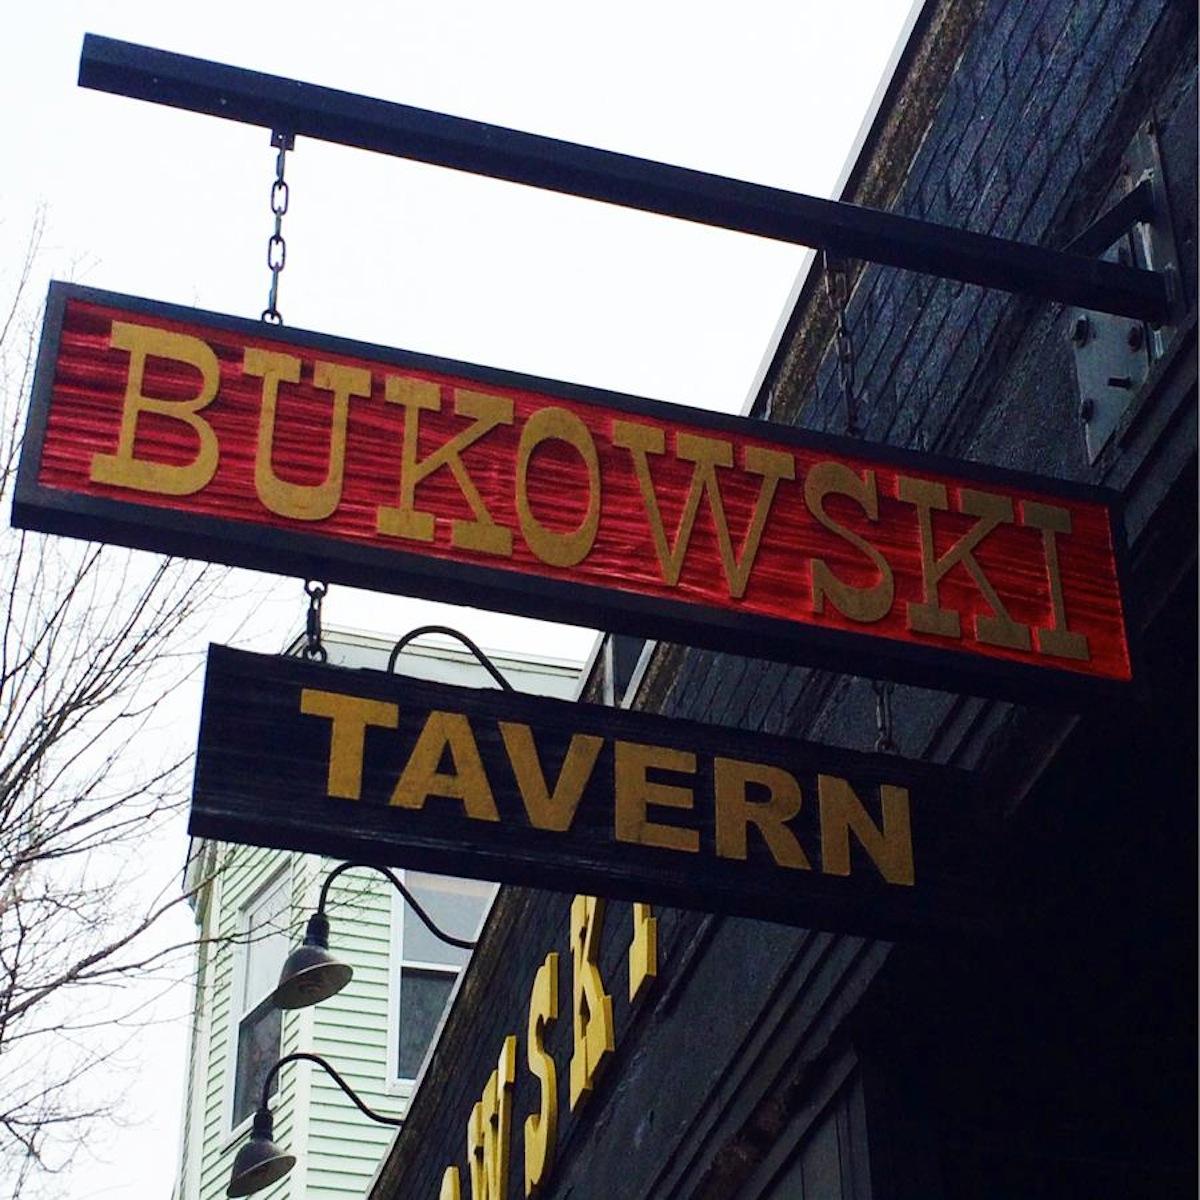 Photo via Bukowski Tavern on Facebook